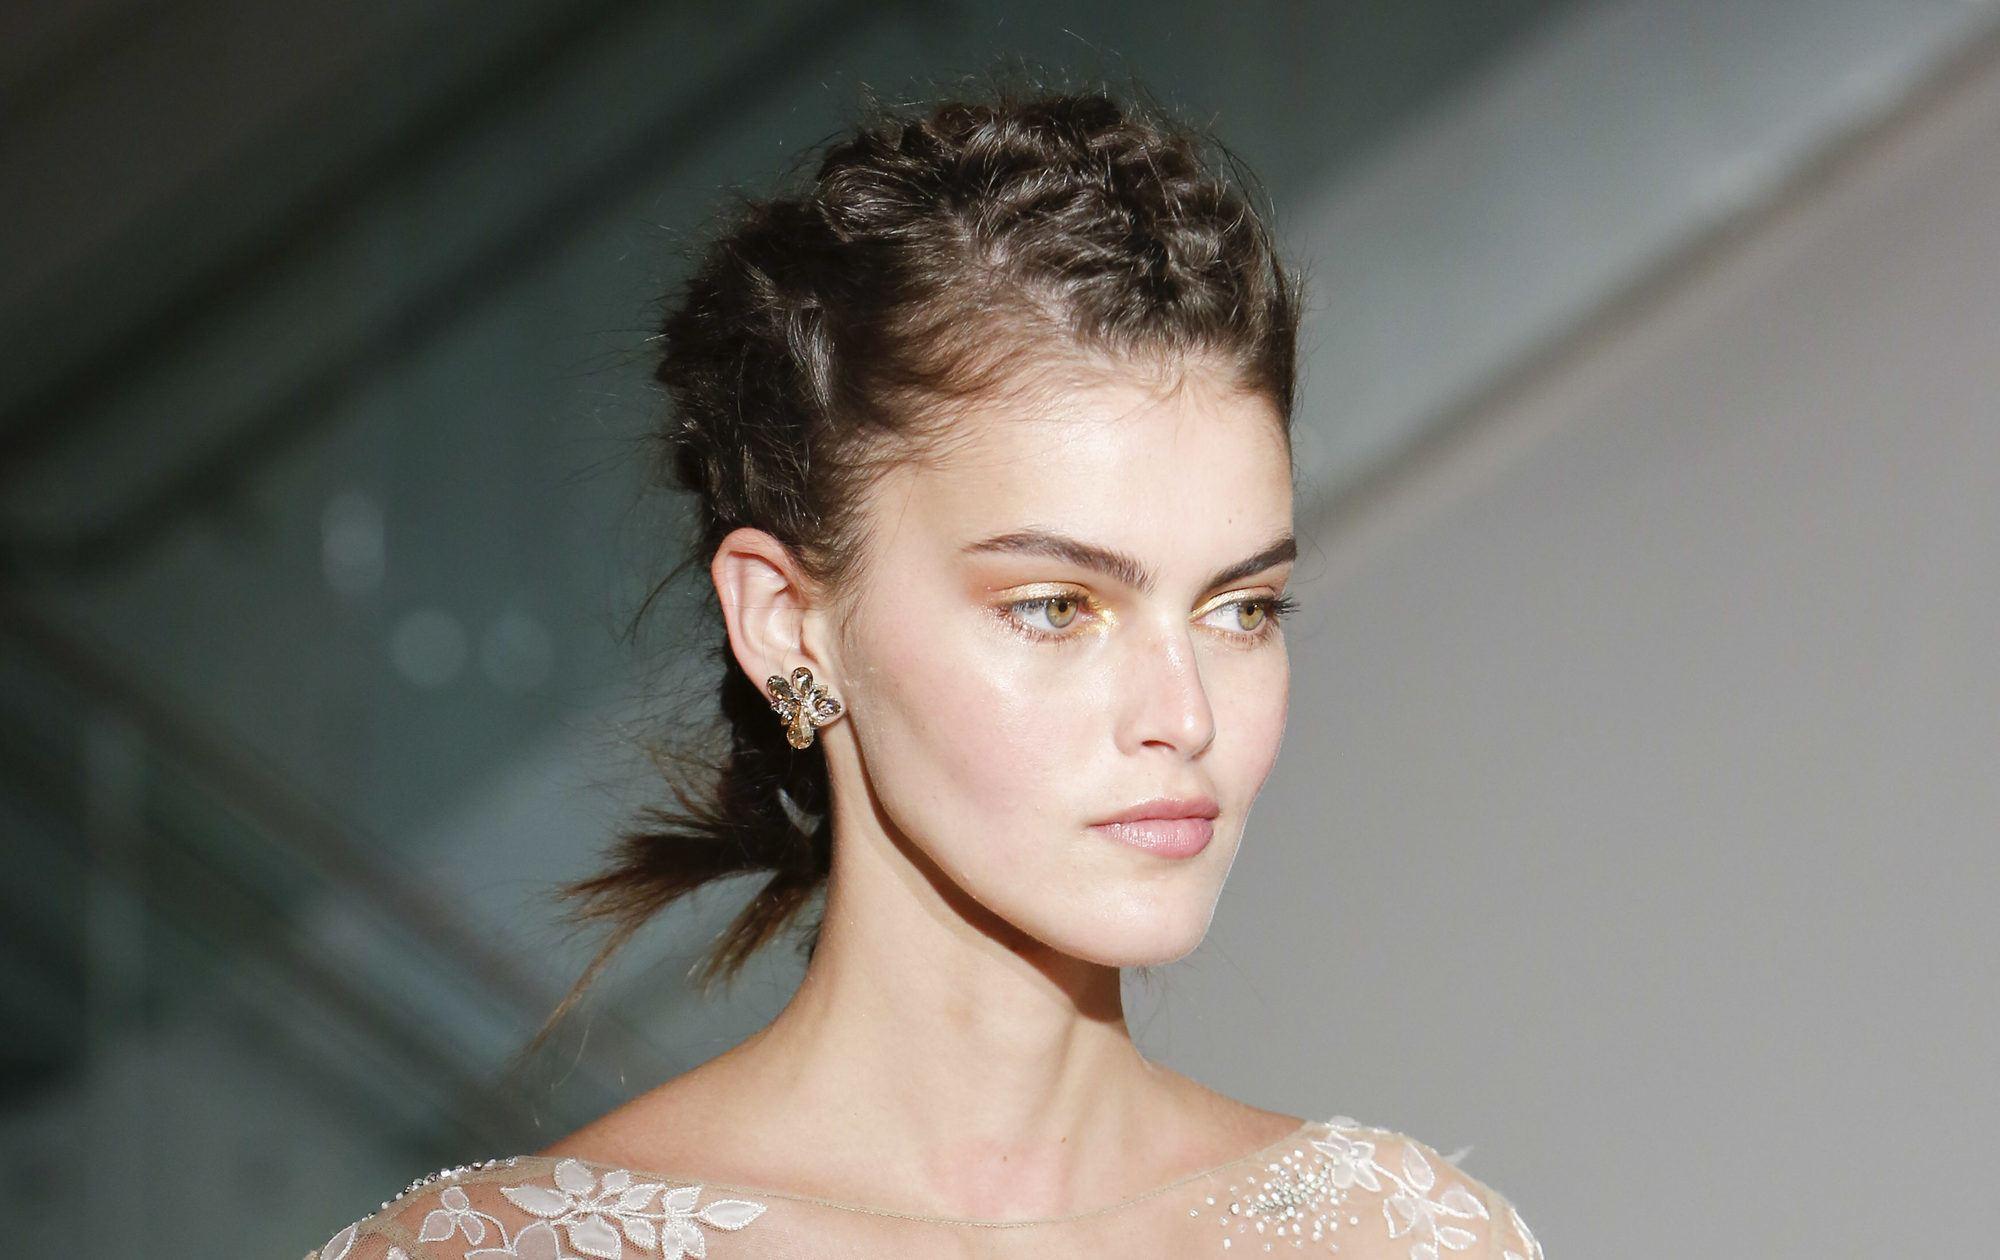 braid for short hair french braid style on model